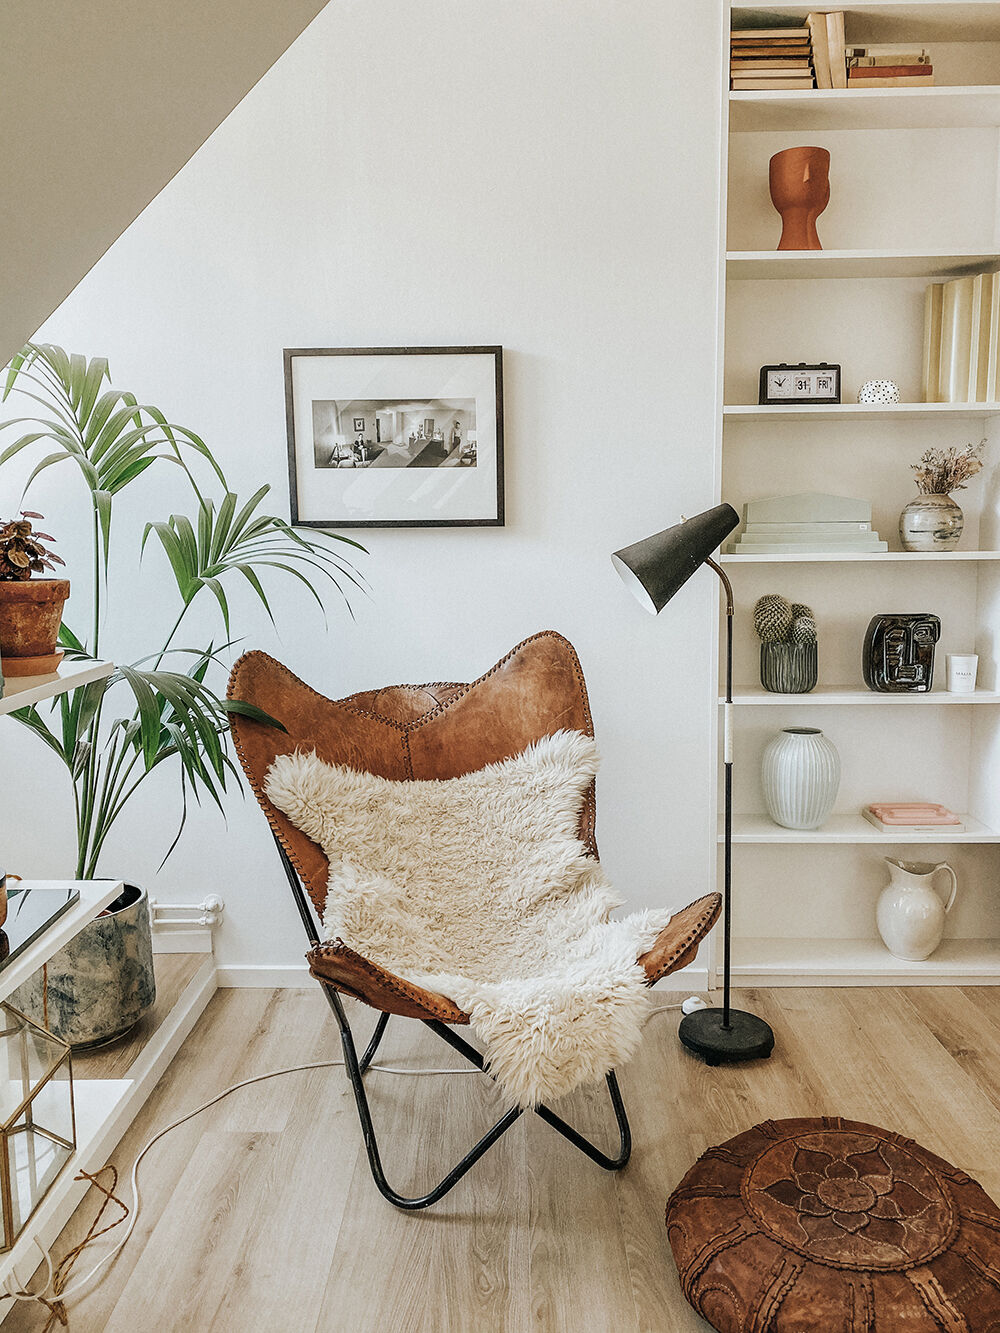 vanja wikström lägenhet fåtölj